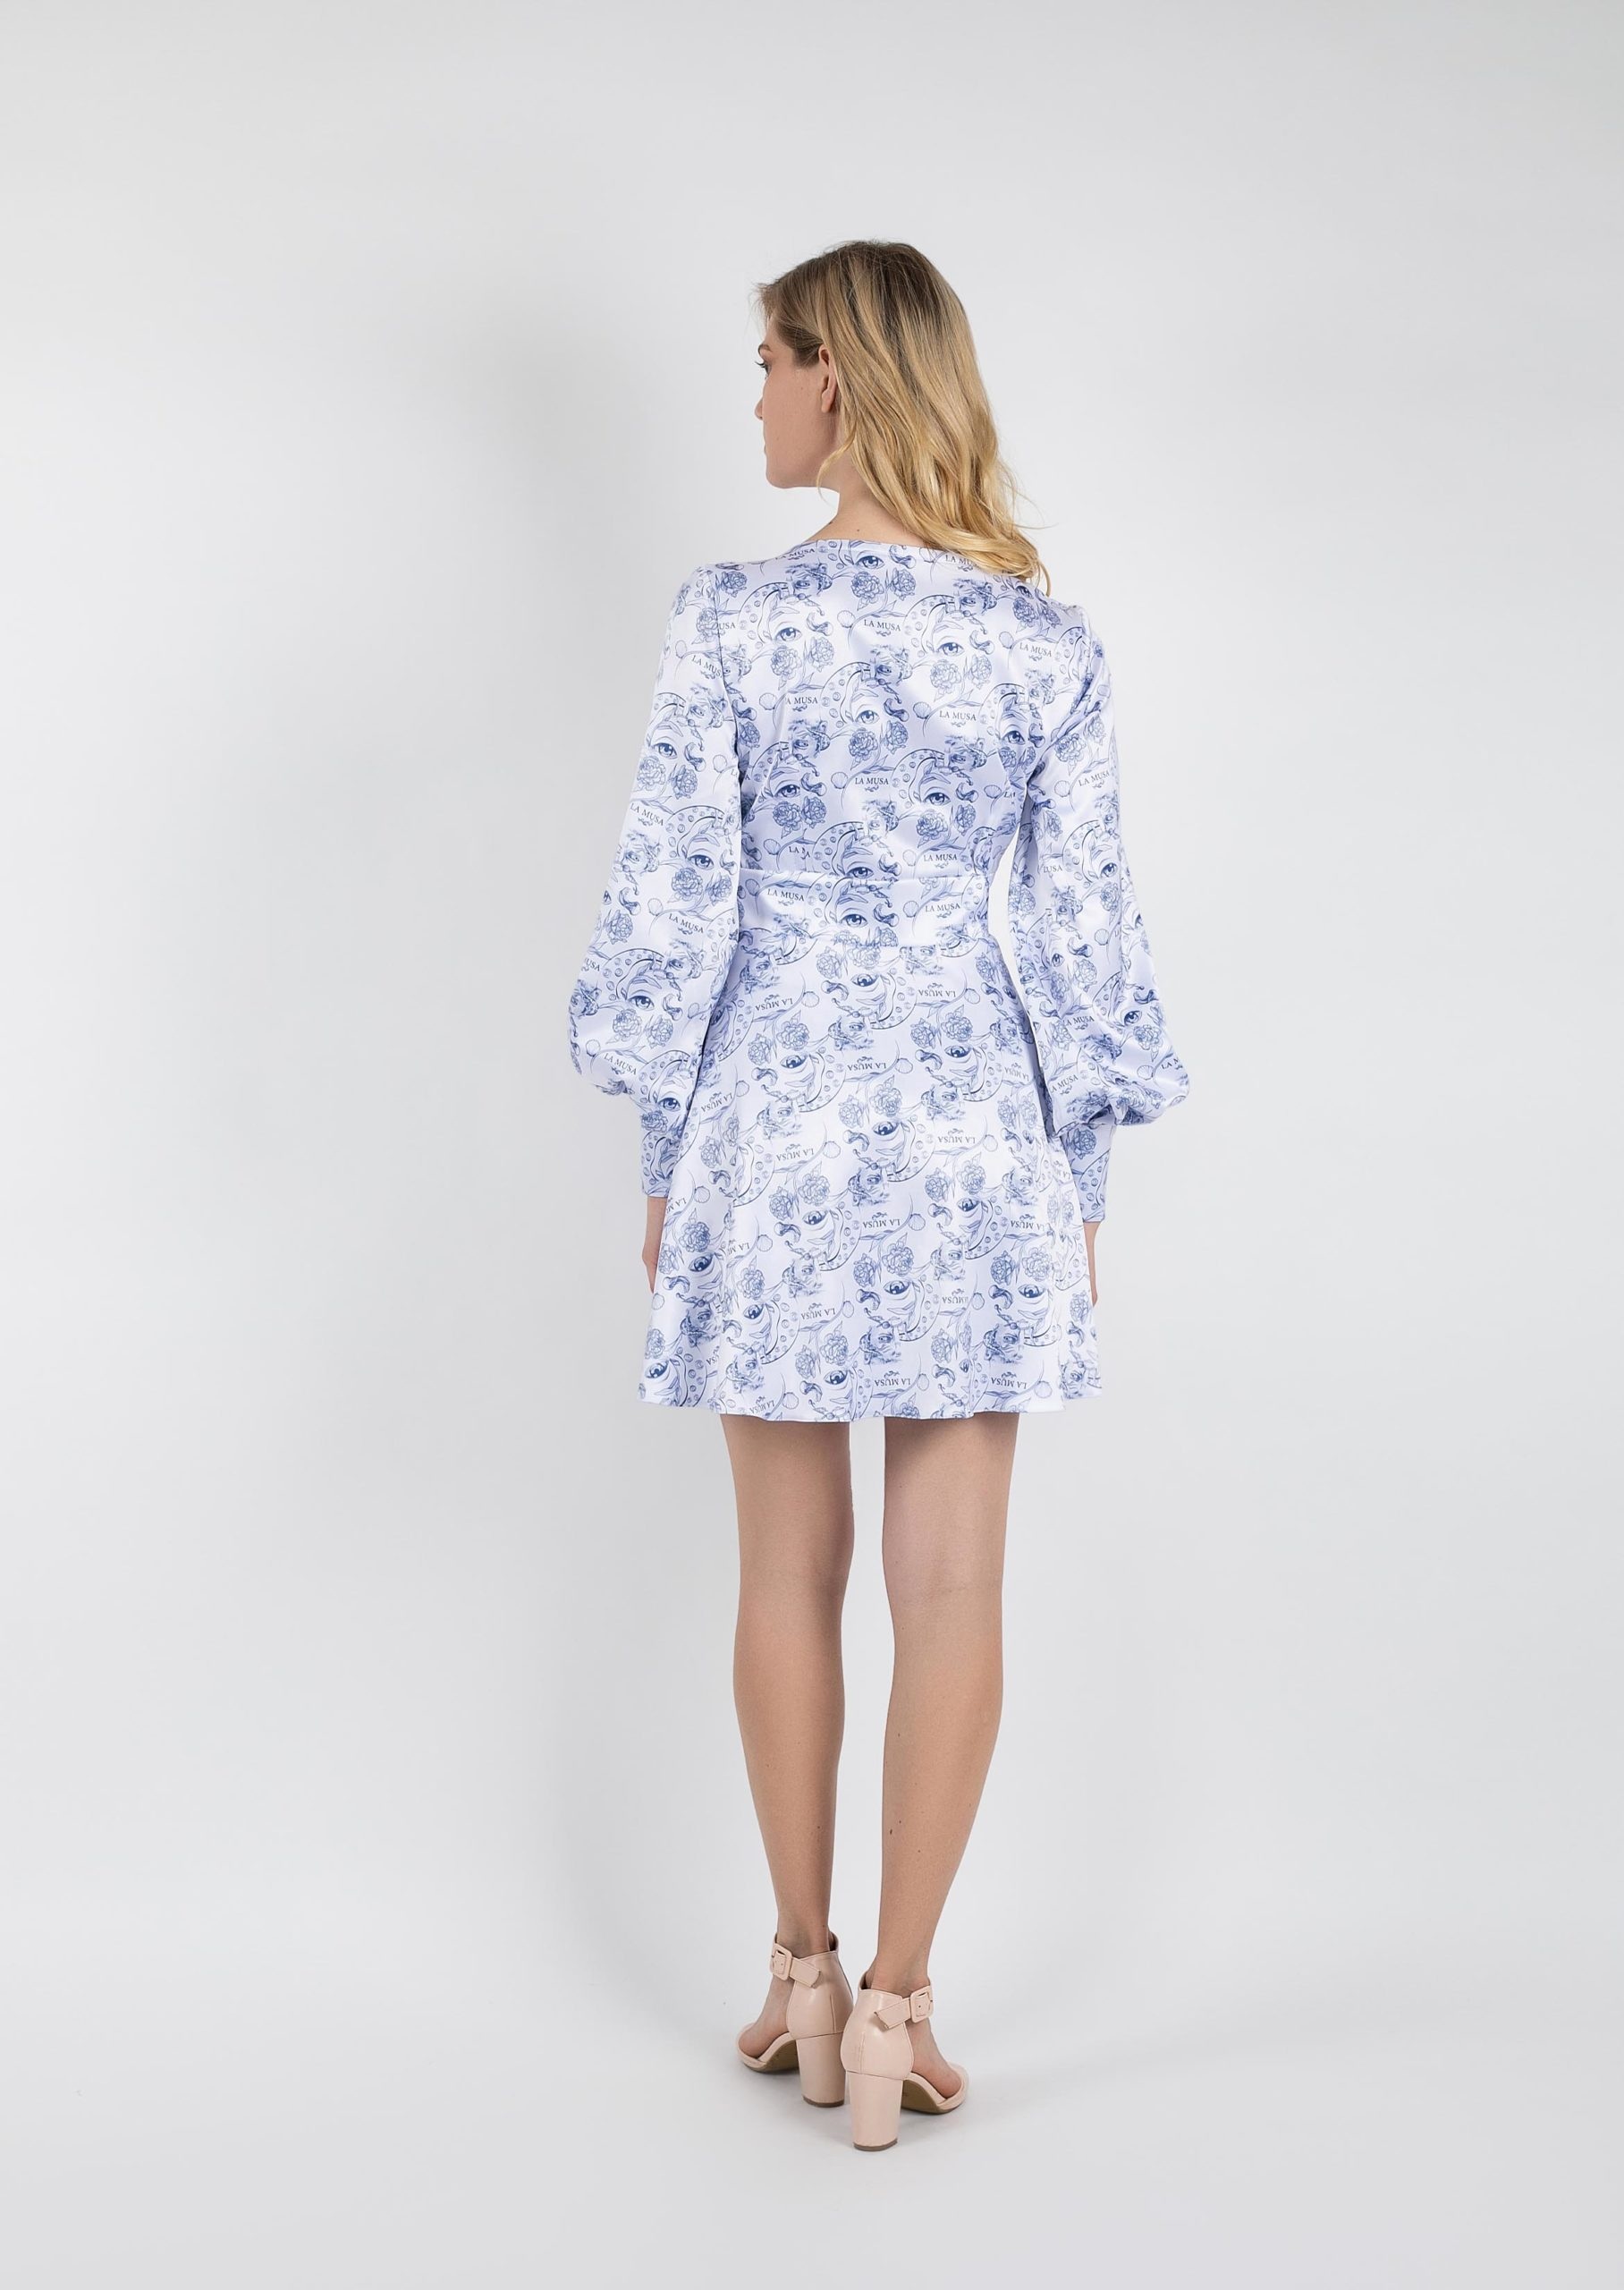 Porcelain passion dress / white neckline dress with blue print / wedding bridesmaid long sleeve dress / vintage grecian goddess short dress